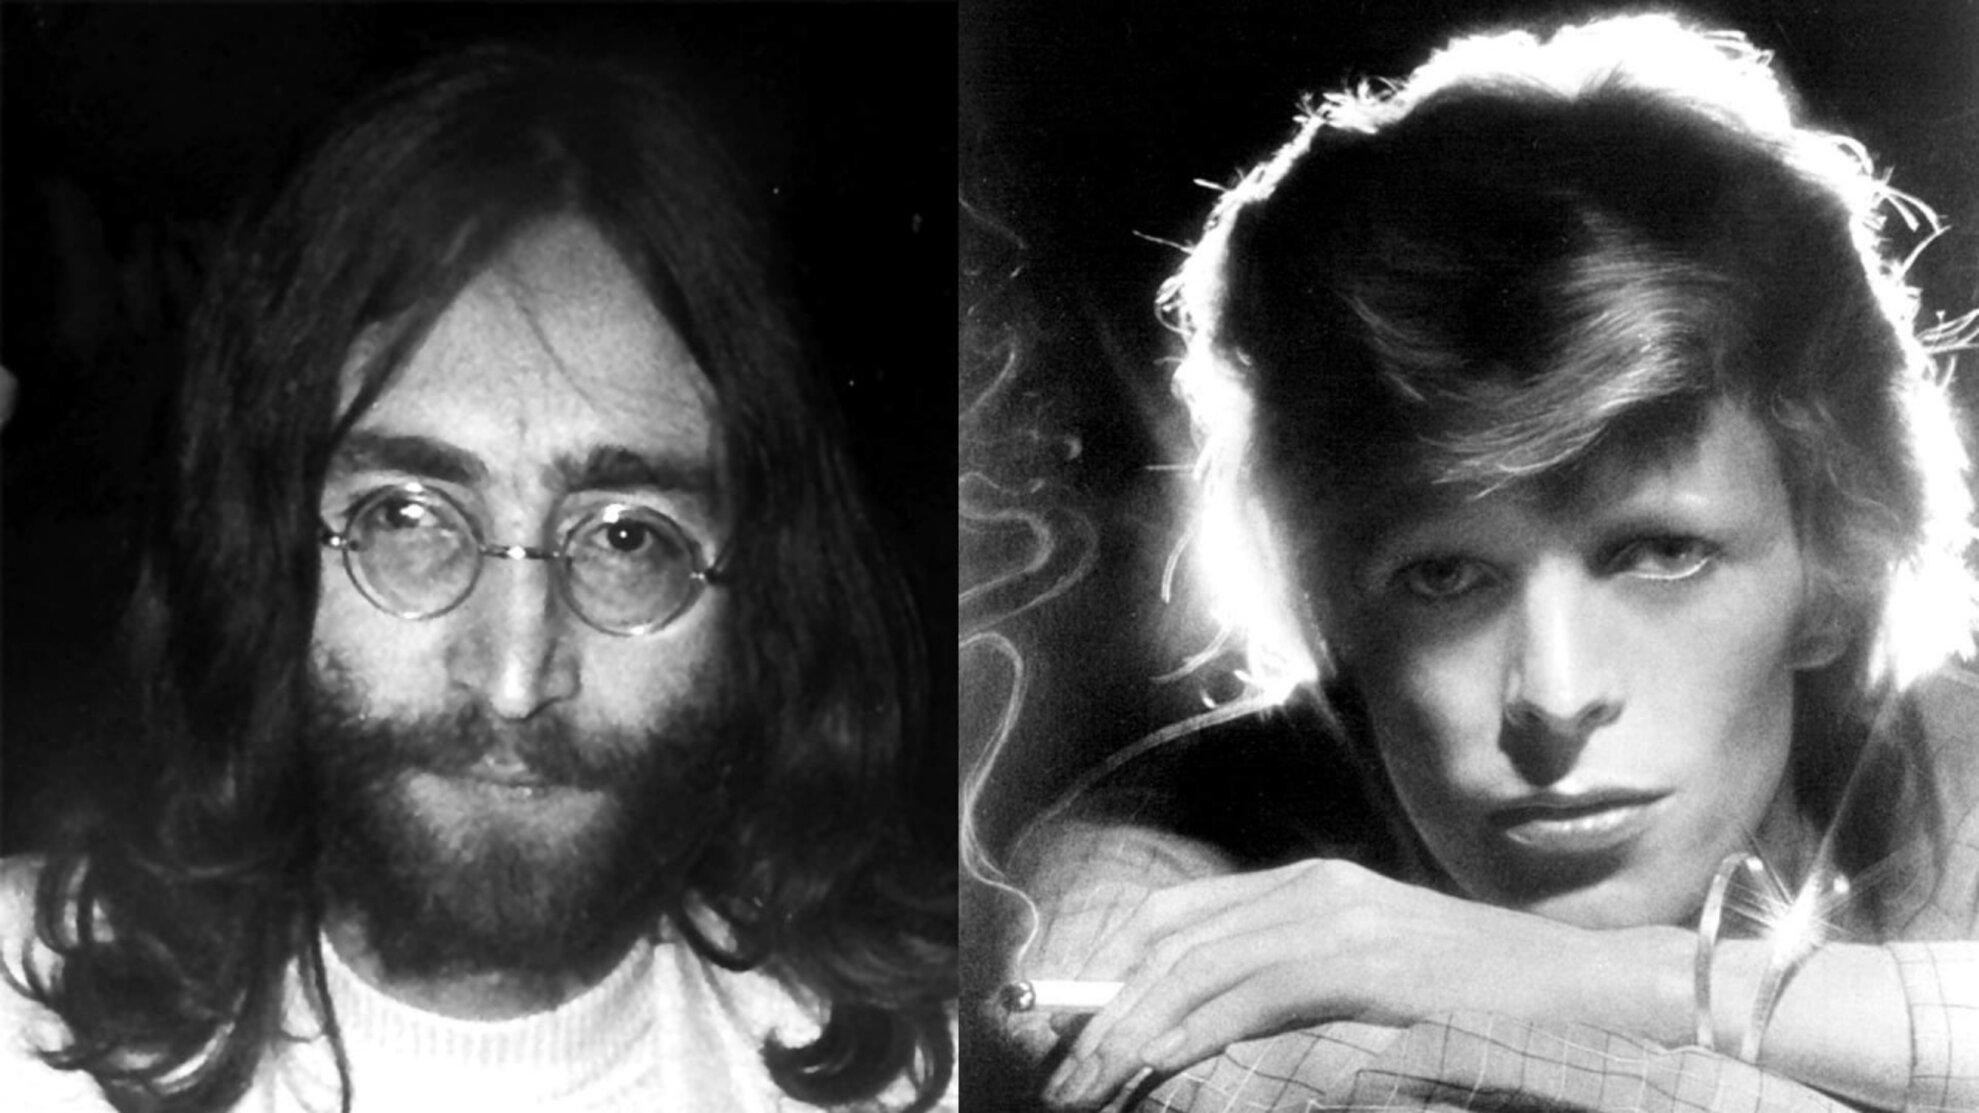 Bowie and friends vol. 3: John Lennon